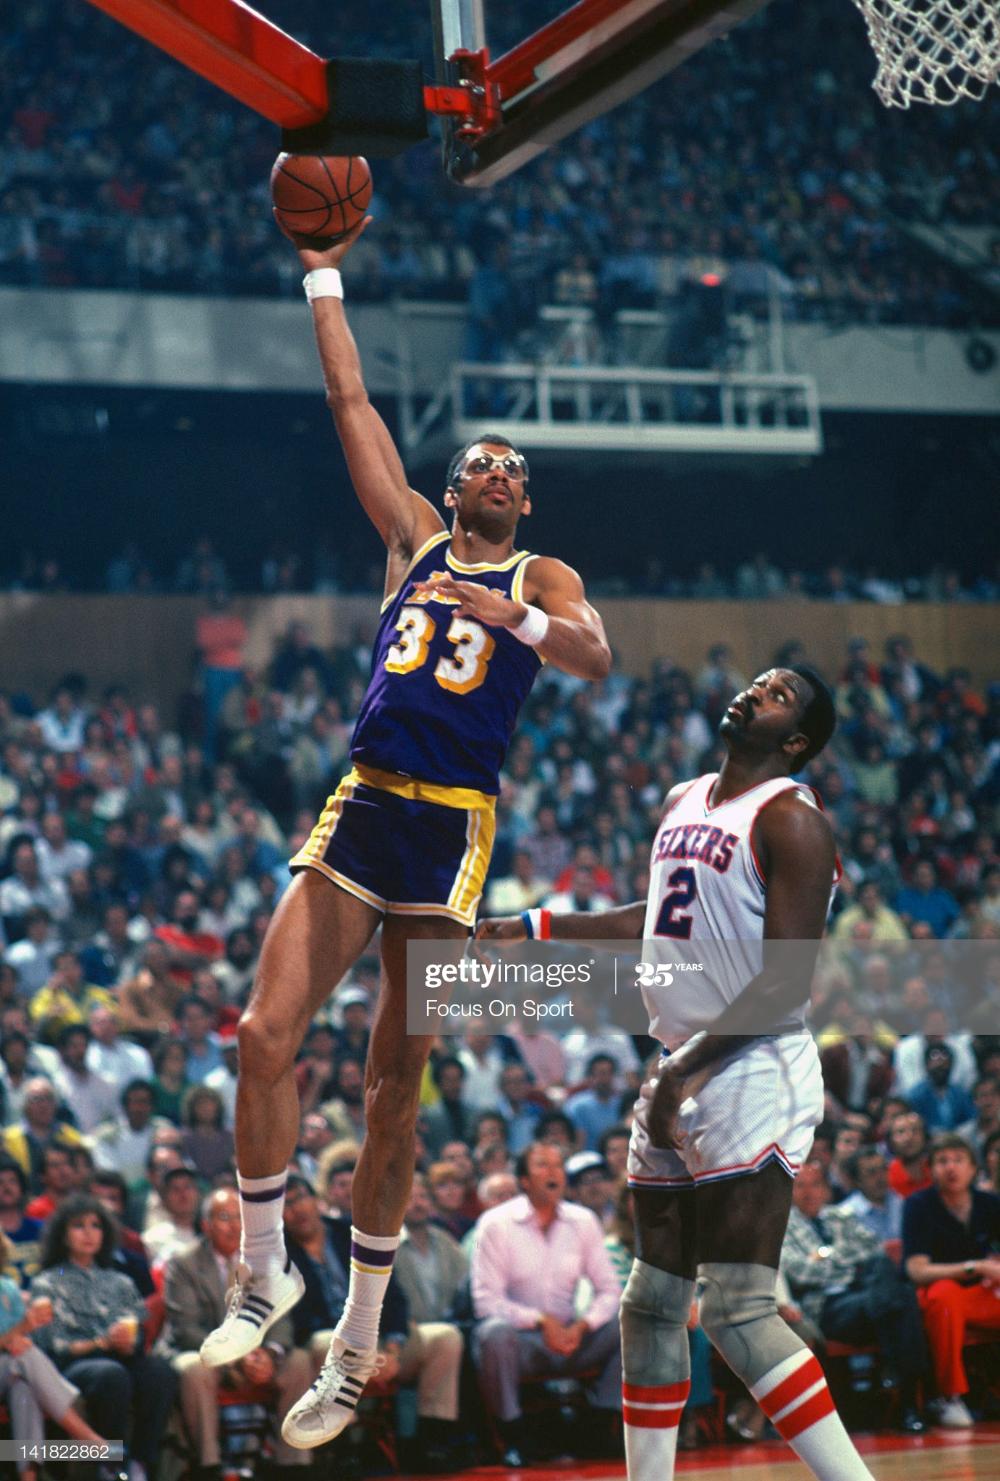 Kareem Abdul Jabbar Of The Los Angeles Lakers Goes Up To Shoot Over Kareem Abdul Jabbar Kareem Abdul Los Angeles Lakers